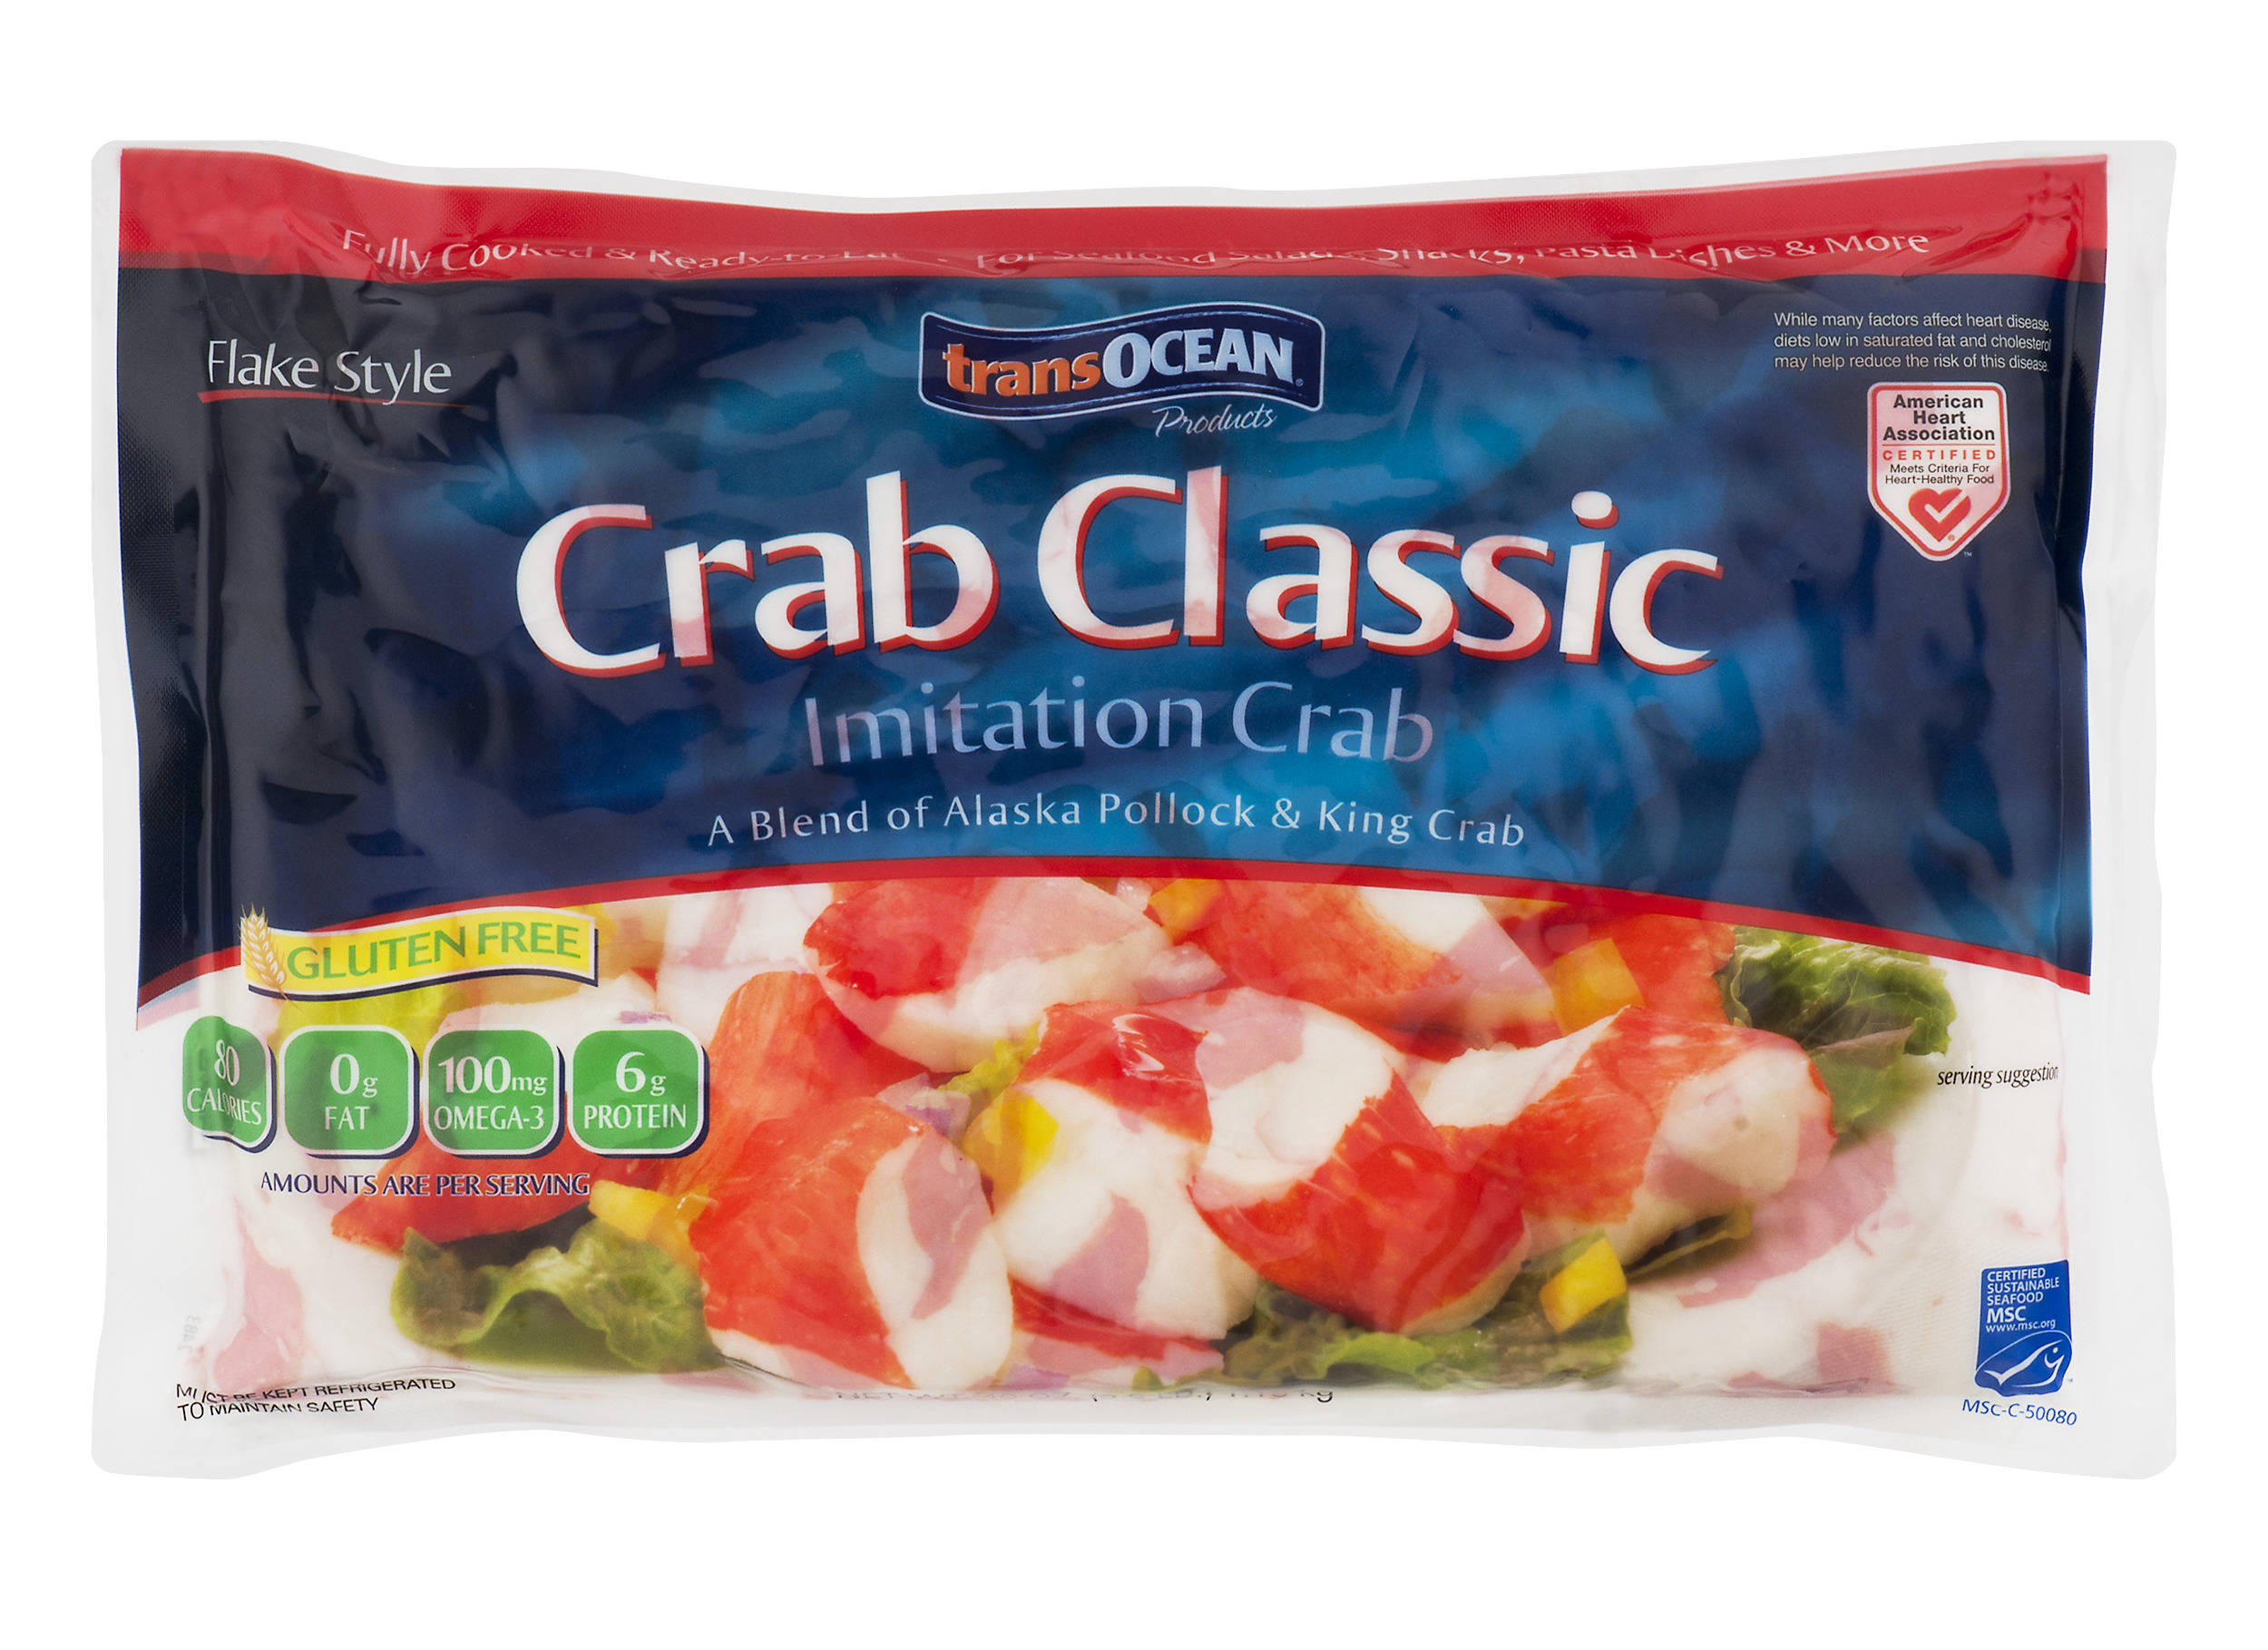 Trans-Ocean Crab Classic Flake Style Imitation Crab 40 oz  Bag